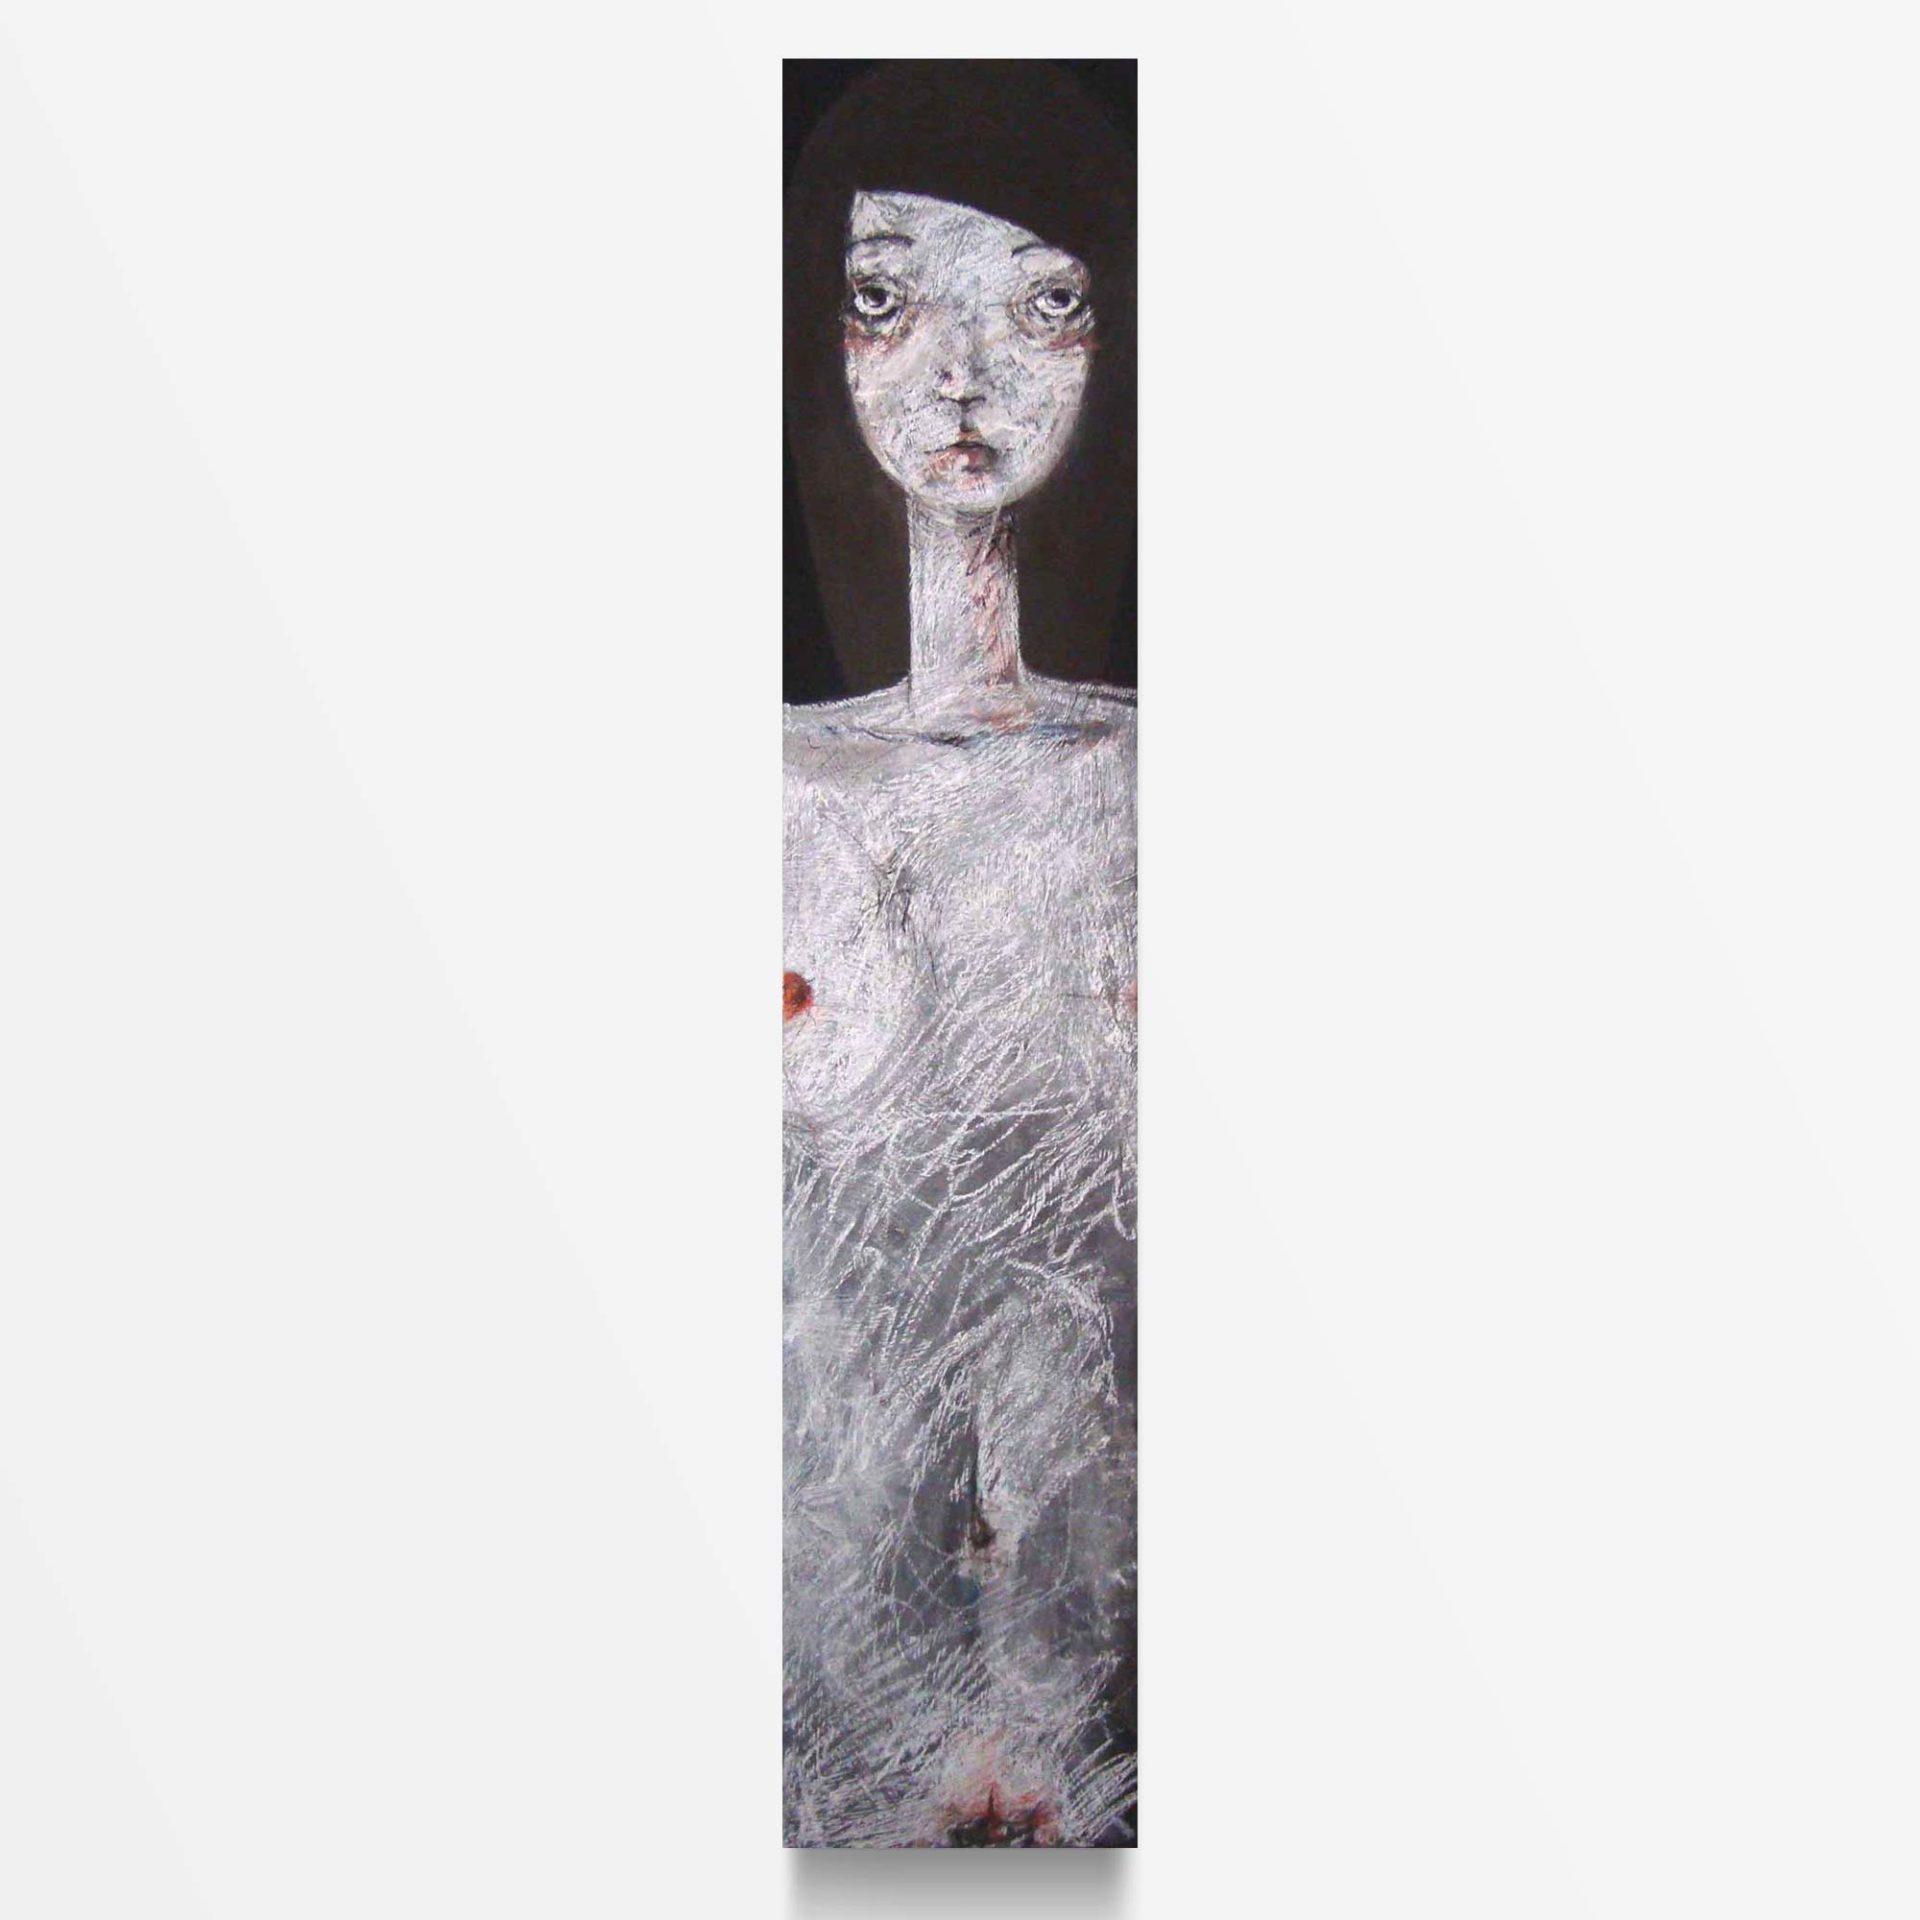 2012 Fondi Neri Totem, quadro ad acrilico di Diego Gabriele